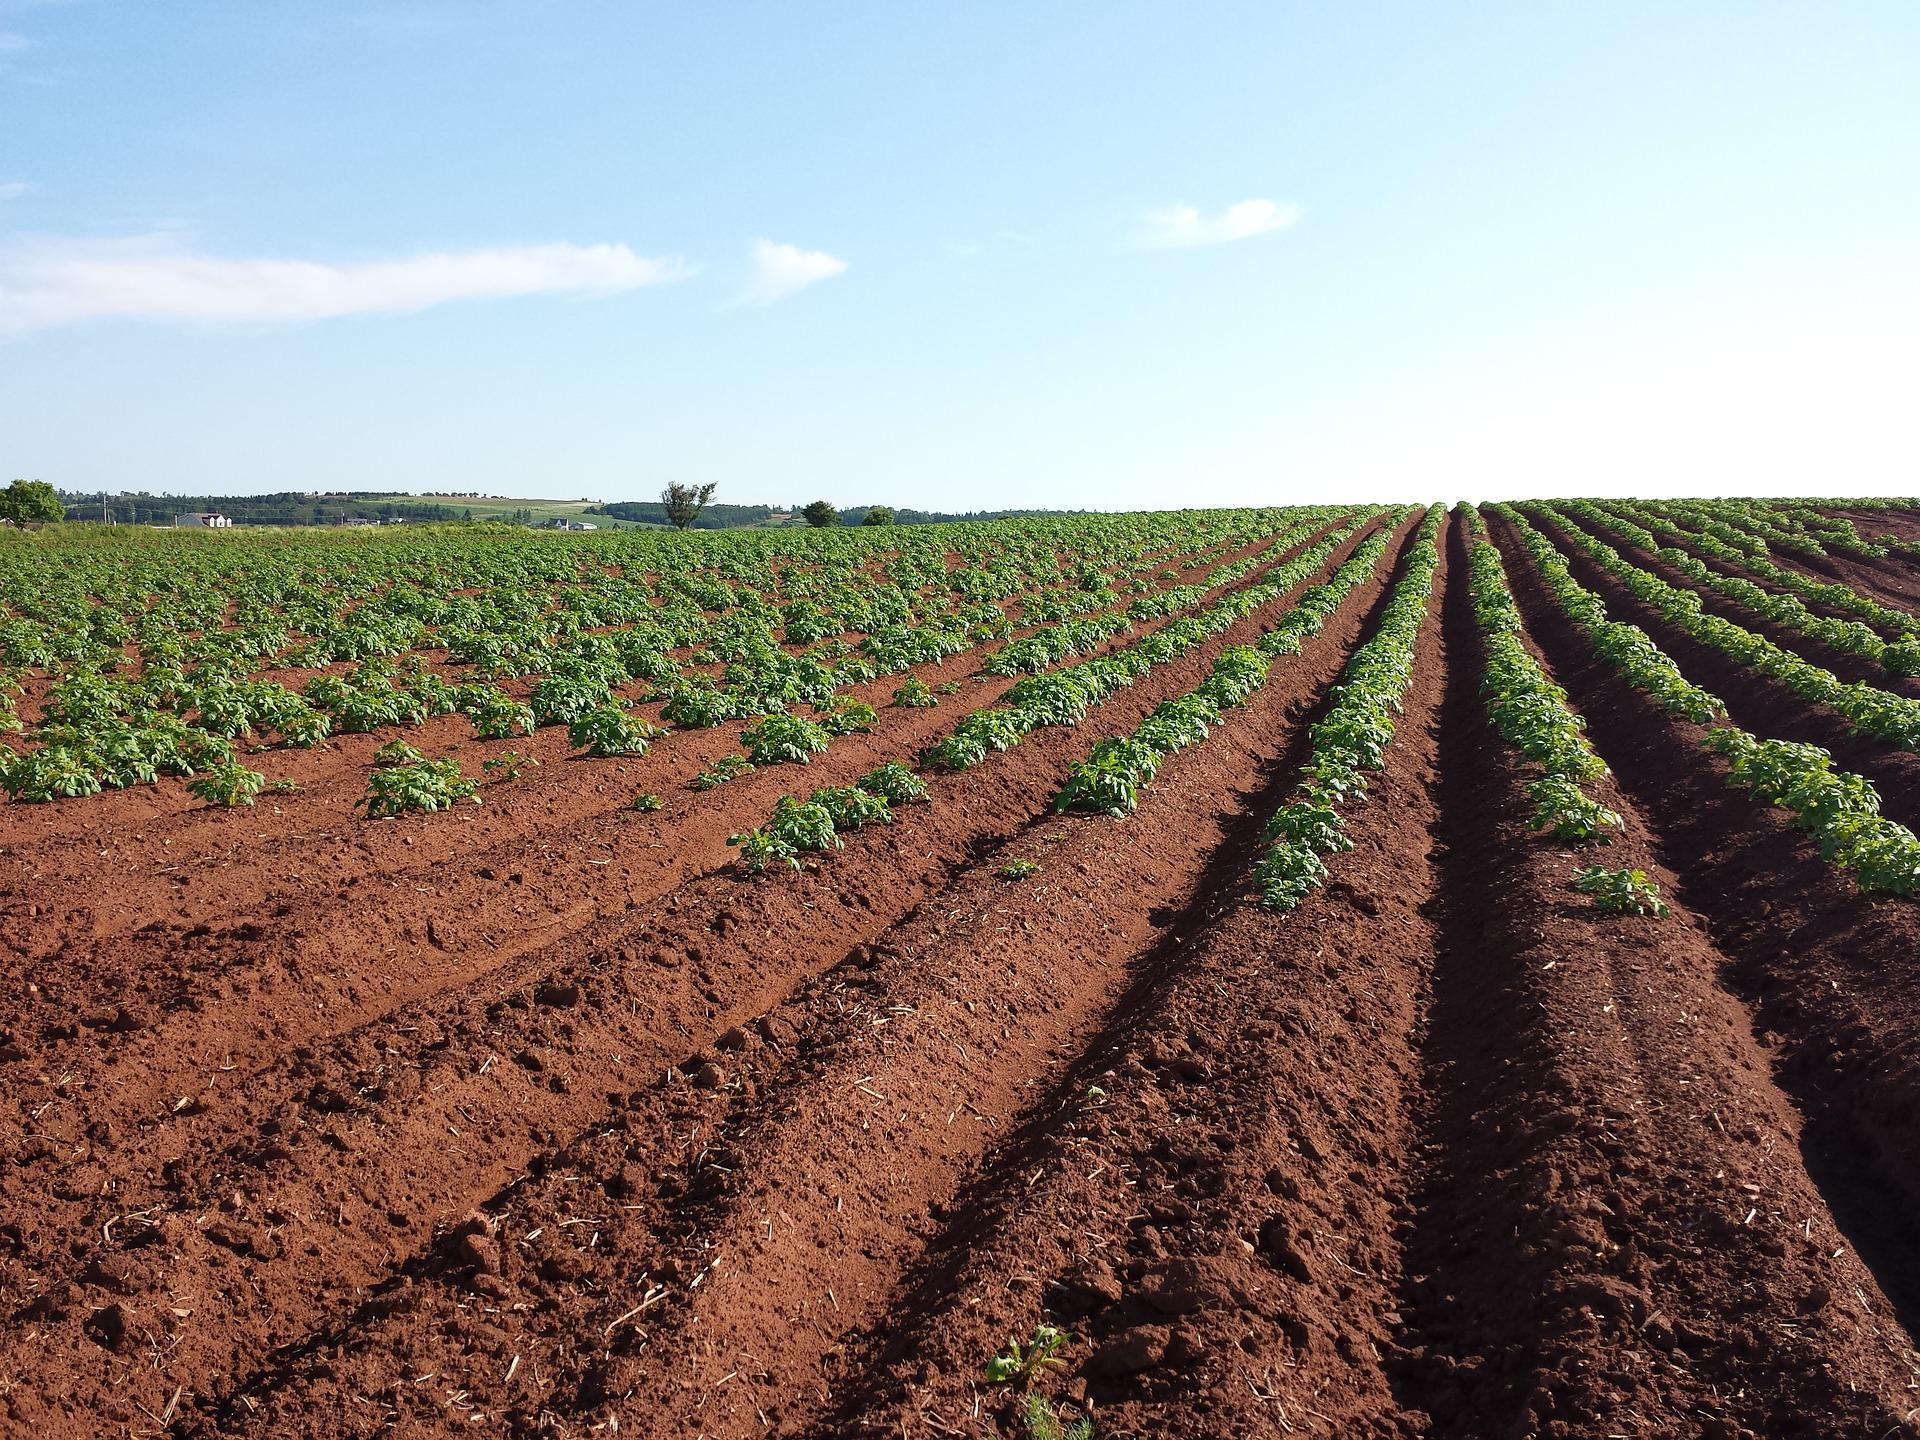 Soil - potato field with blue skies.